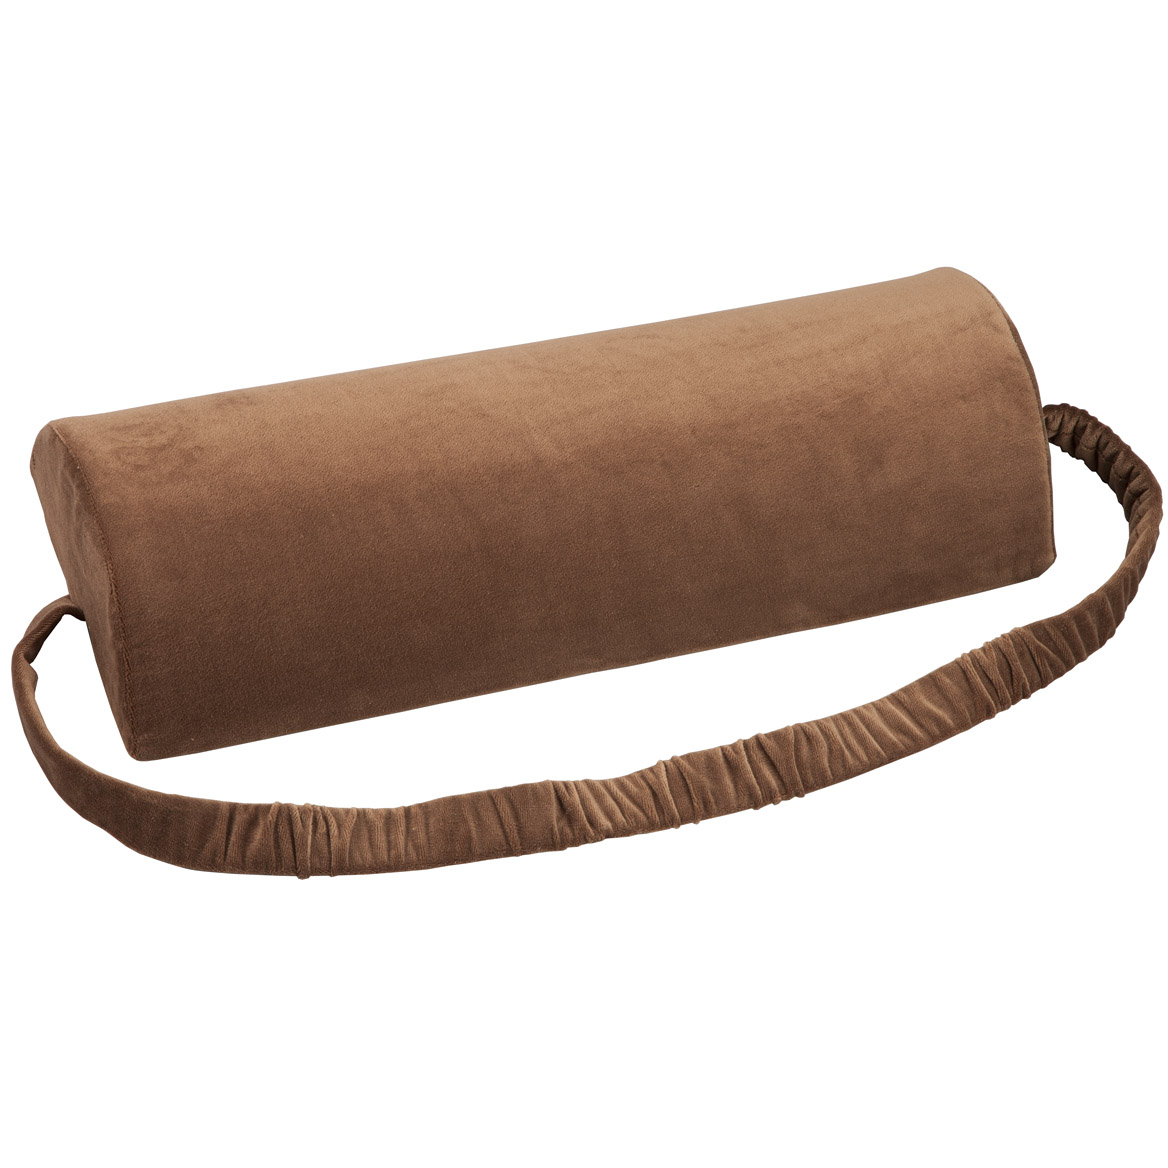 Multi Purpose Recliner Cushion-350261